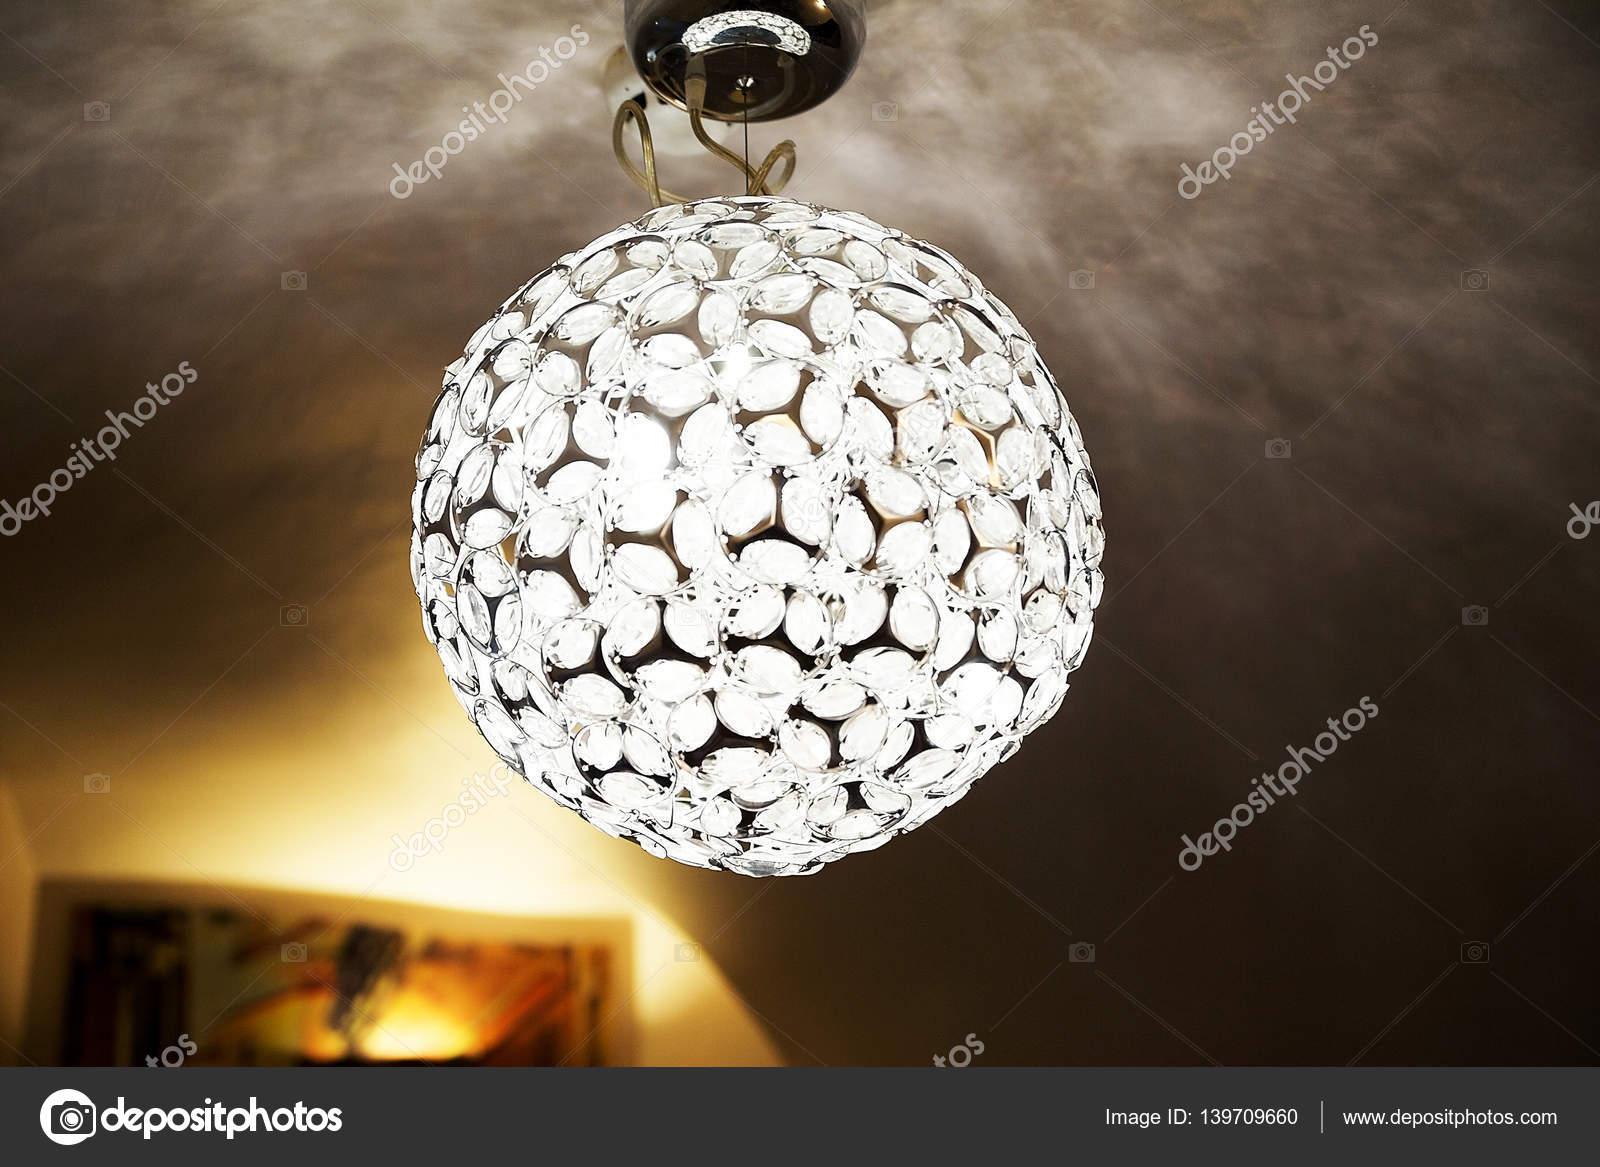 Kristall Kronleuchter Günstig Kaufen ~ Runde mode kristall kronleuchter u stockfoto ribalka